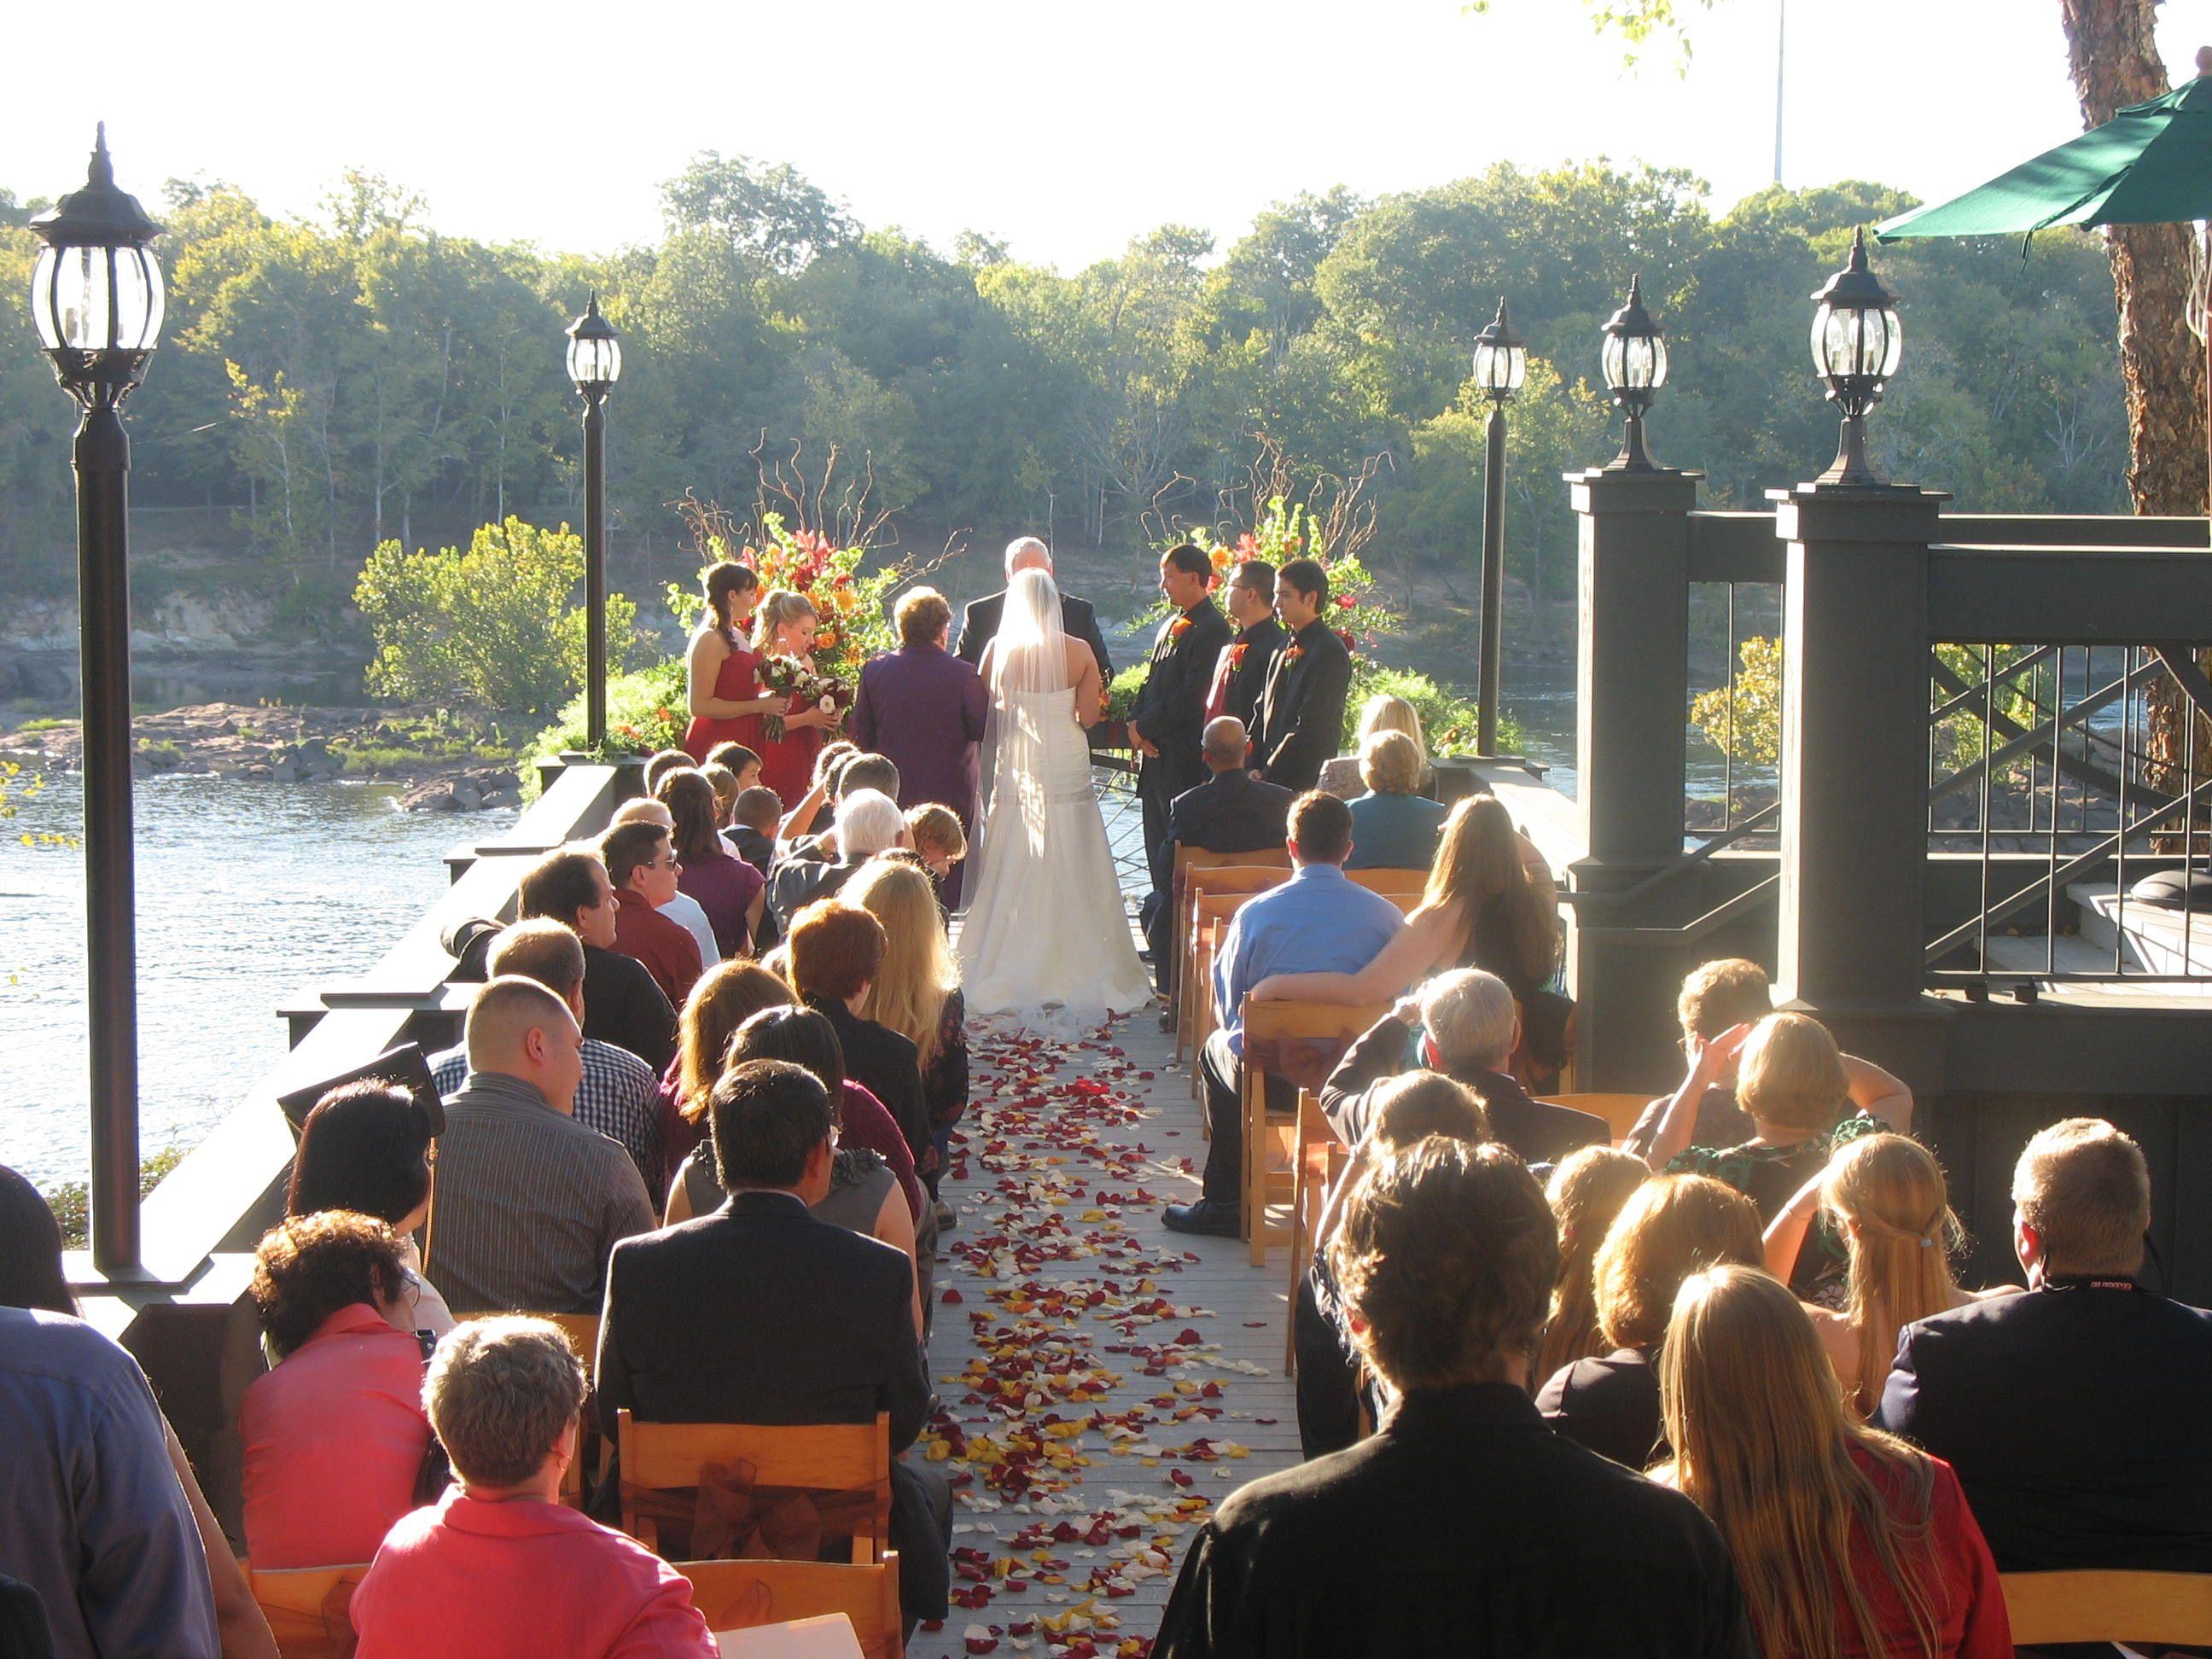 The Chattahoochee River ClubColumbus, GA Outdoor Wedding